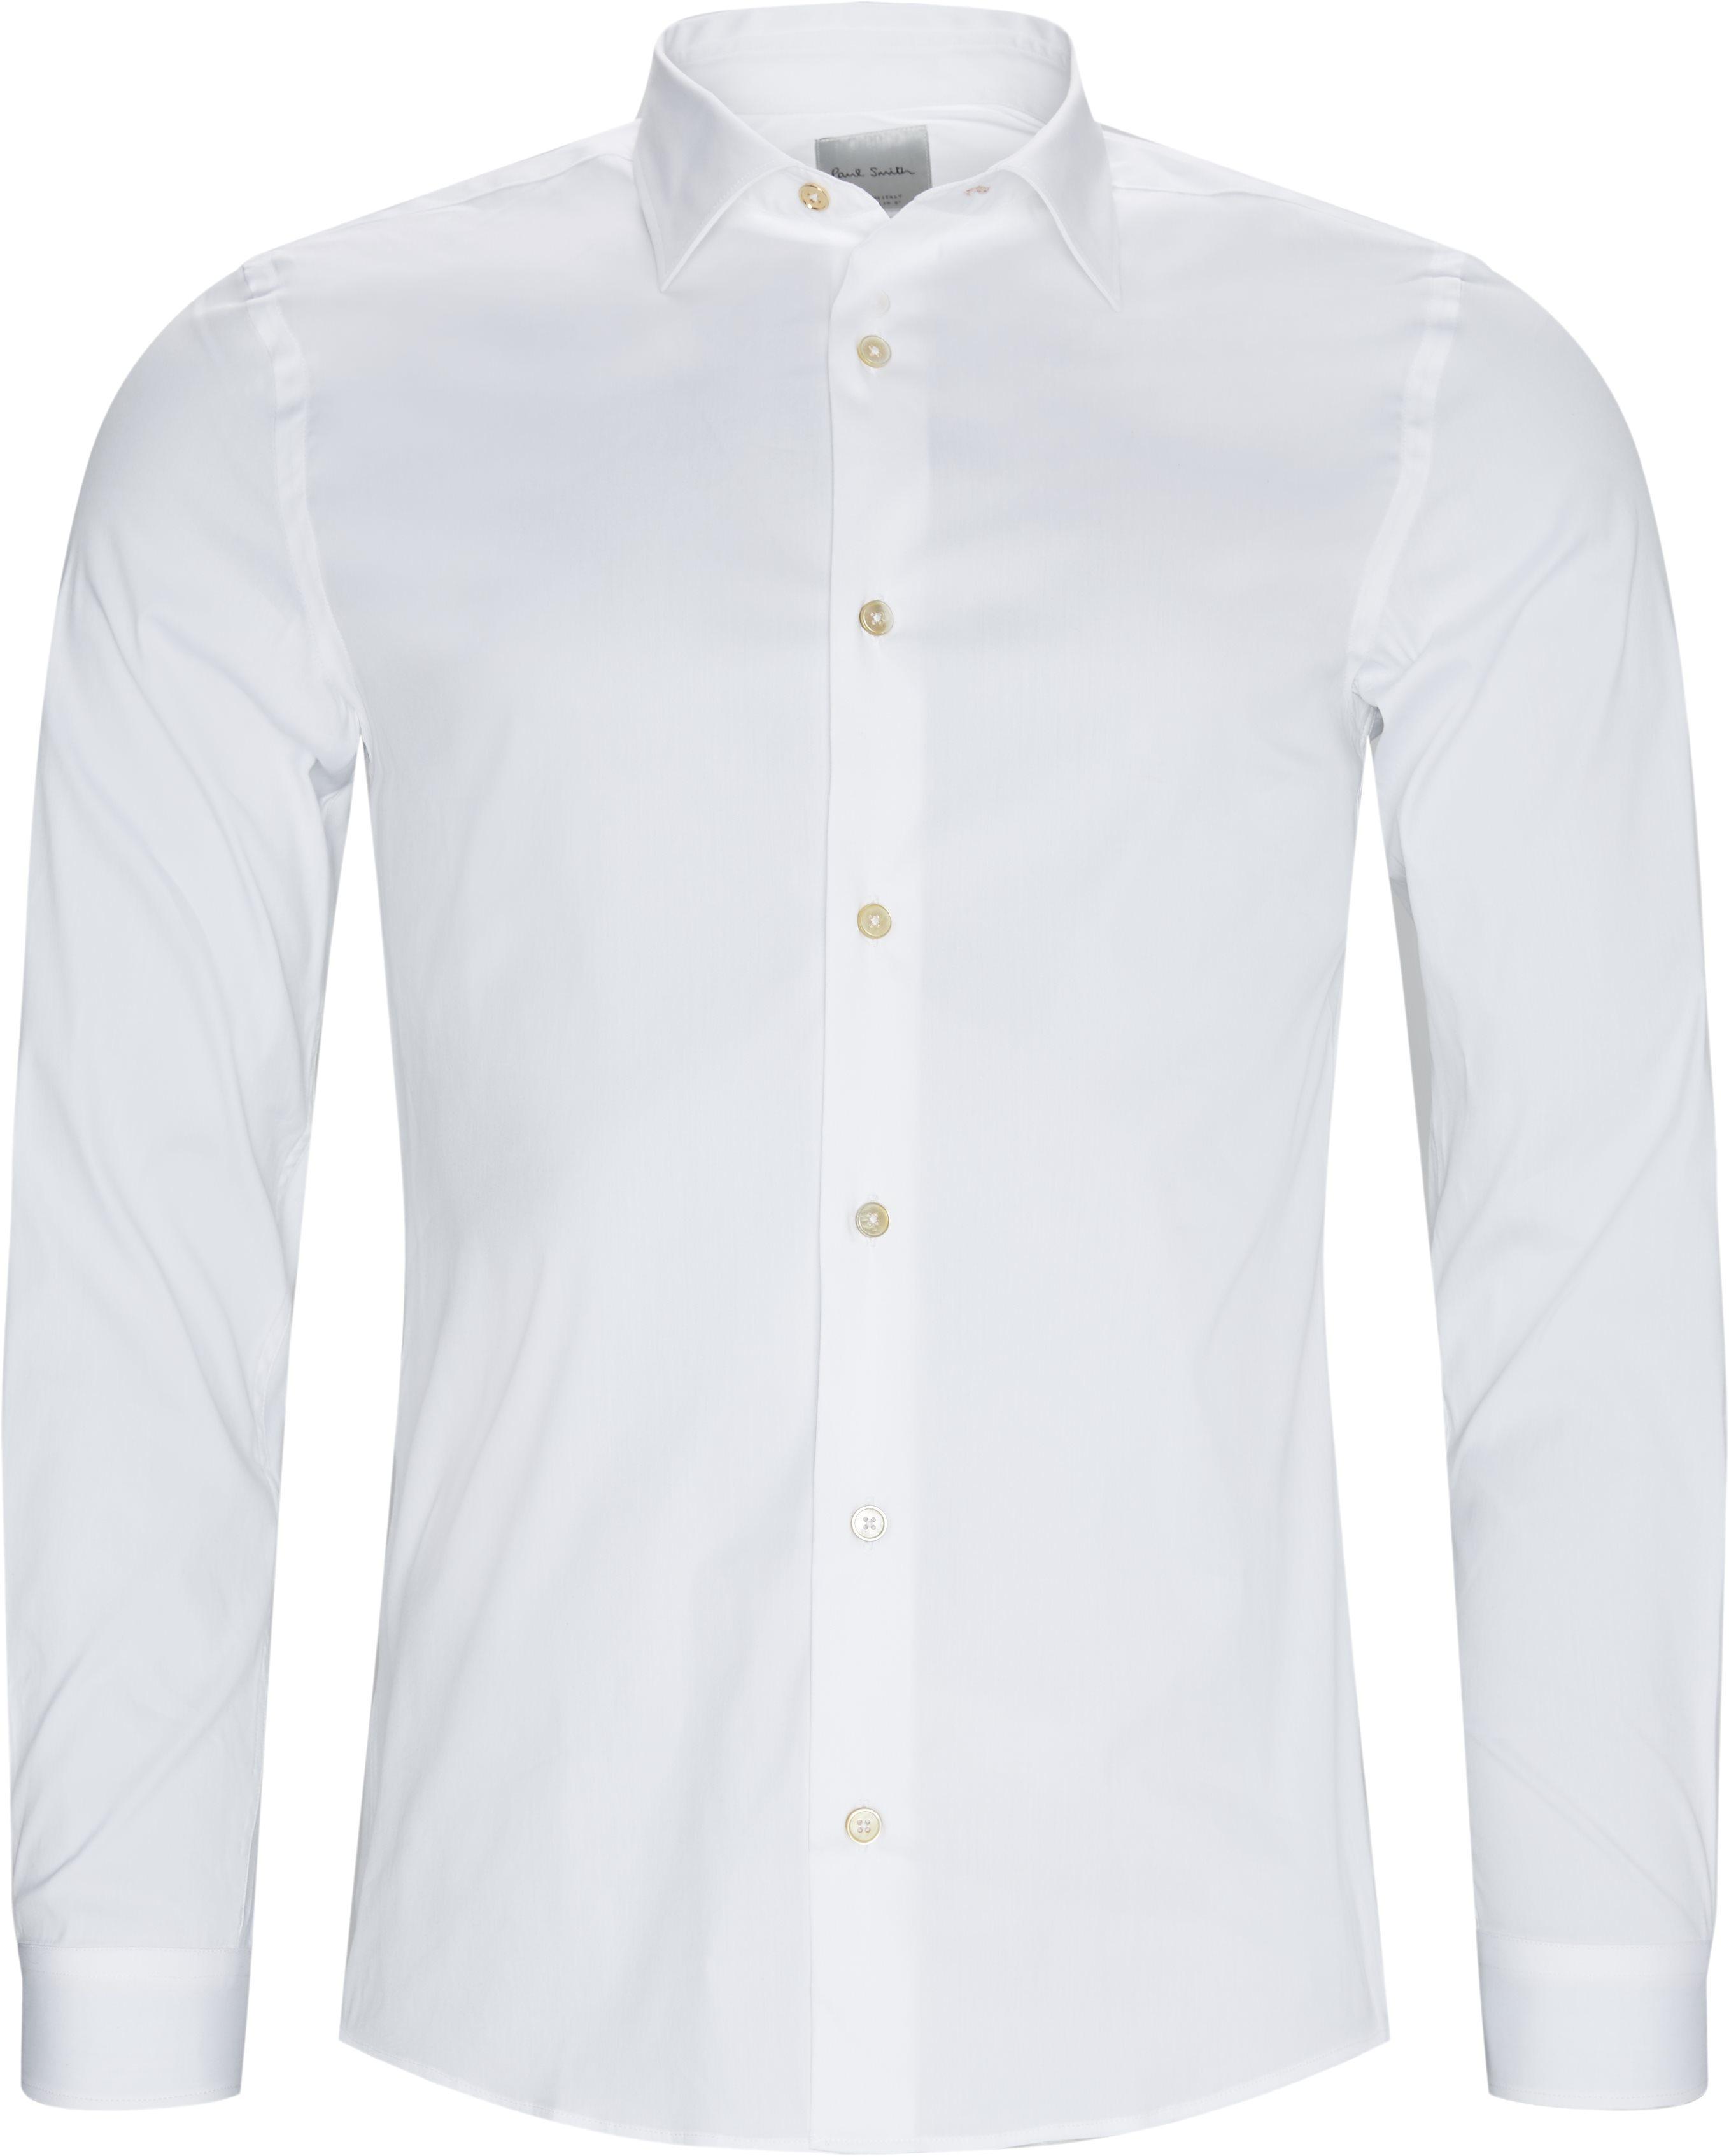 Skjorter - Slim fit - Hvid